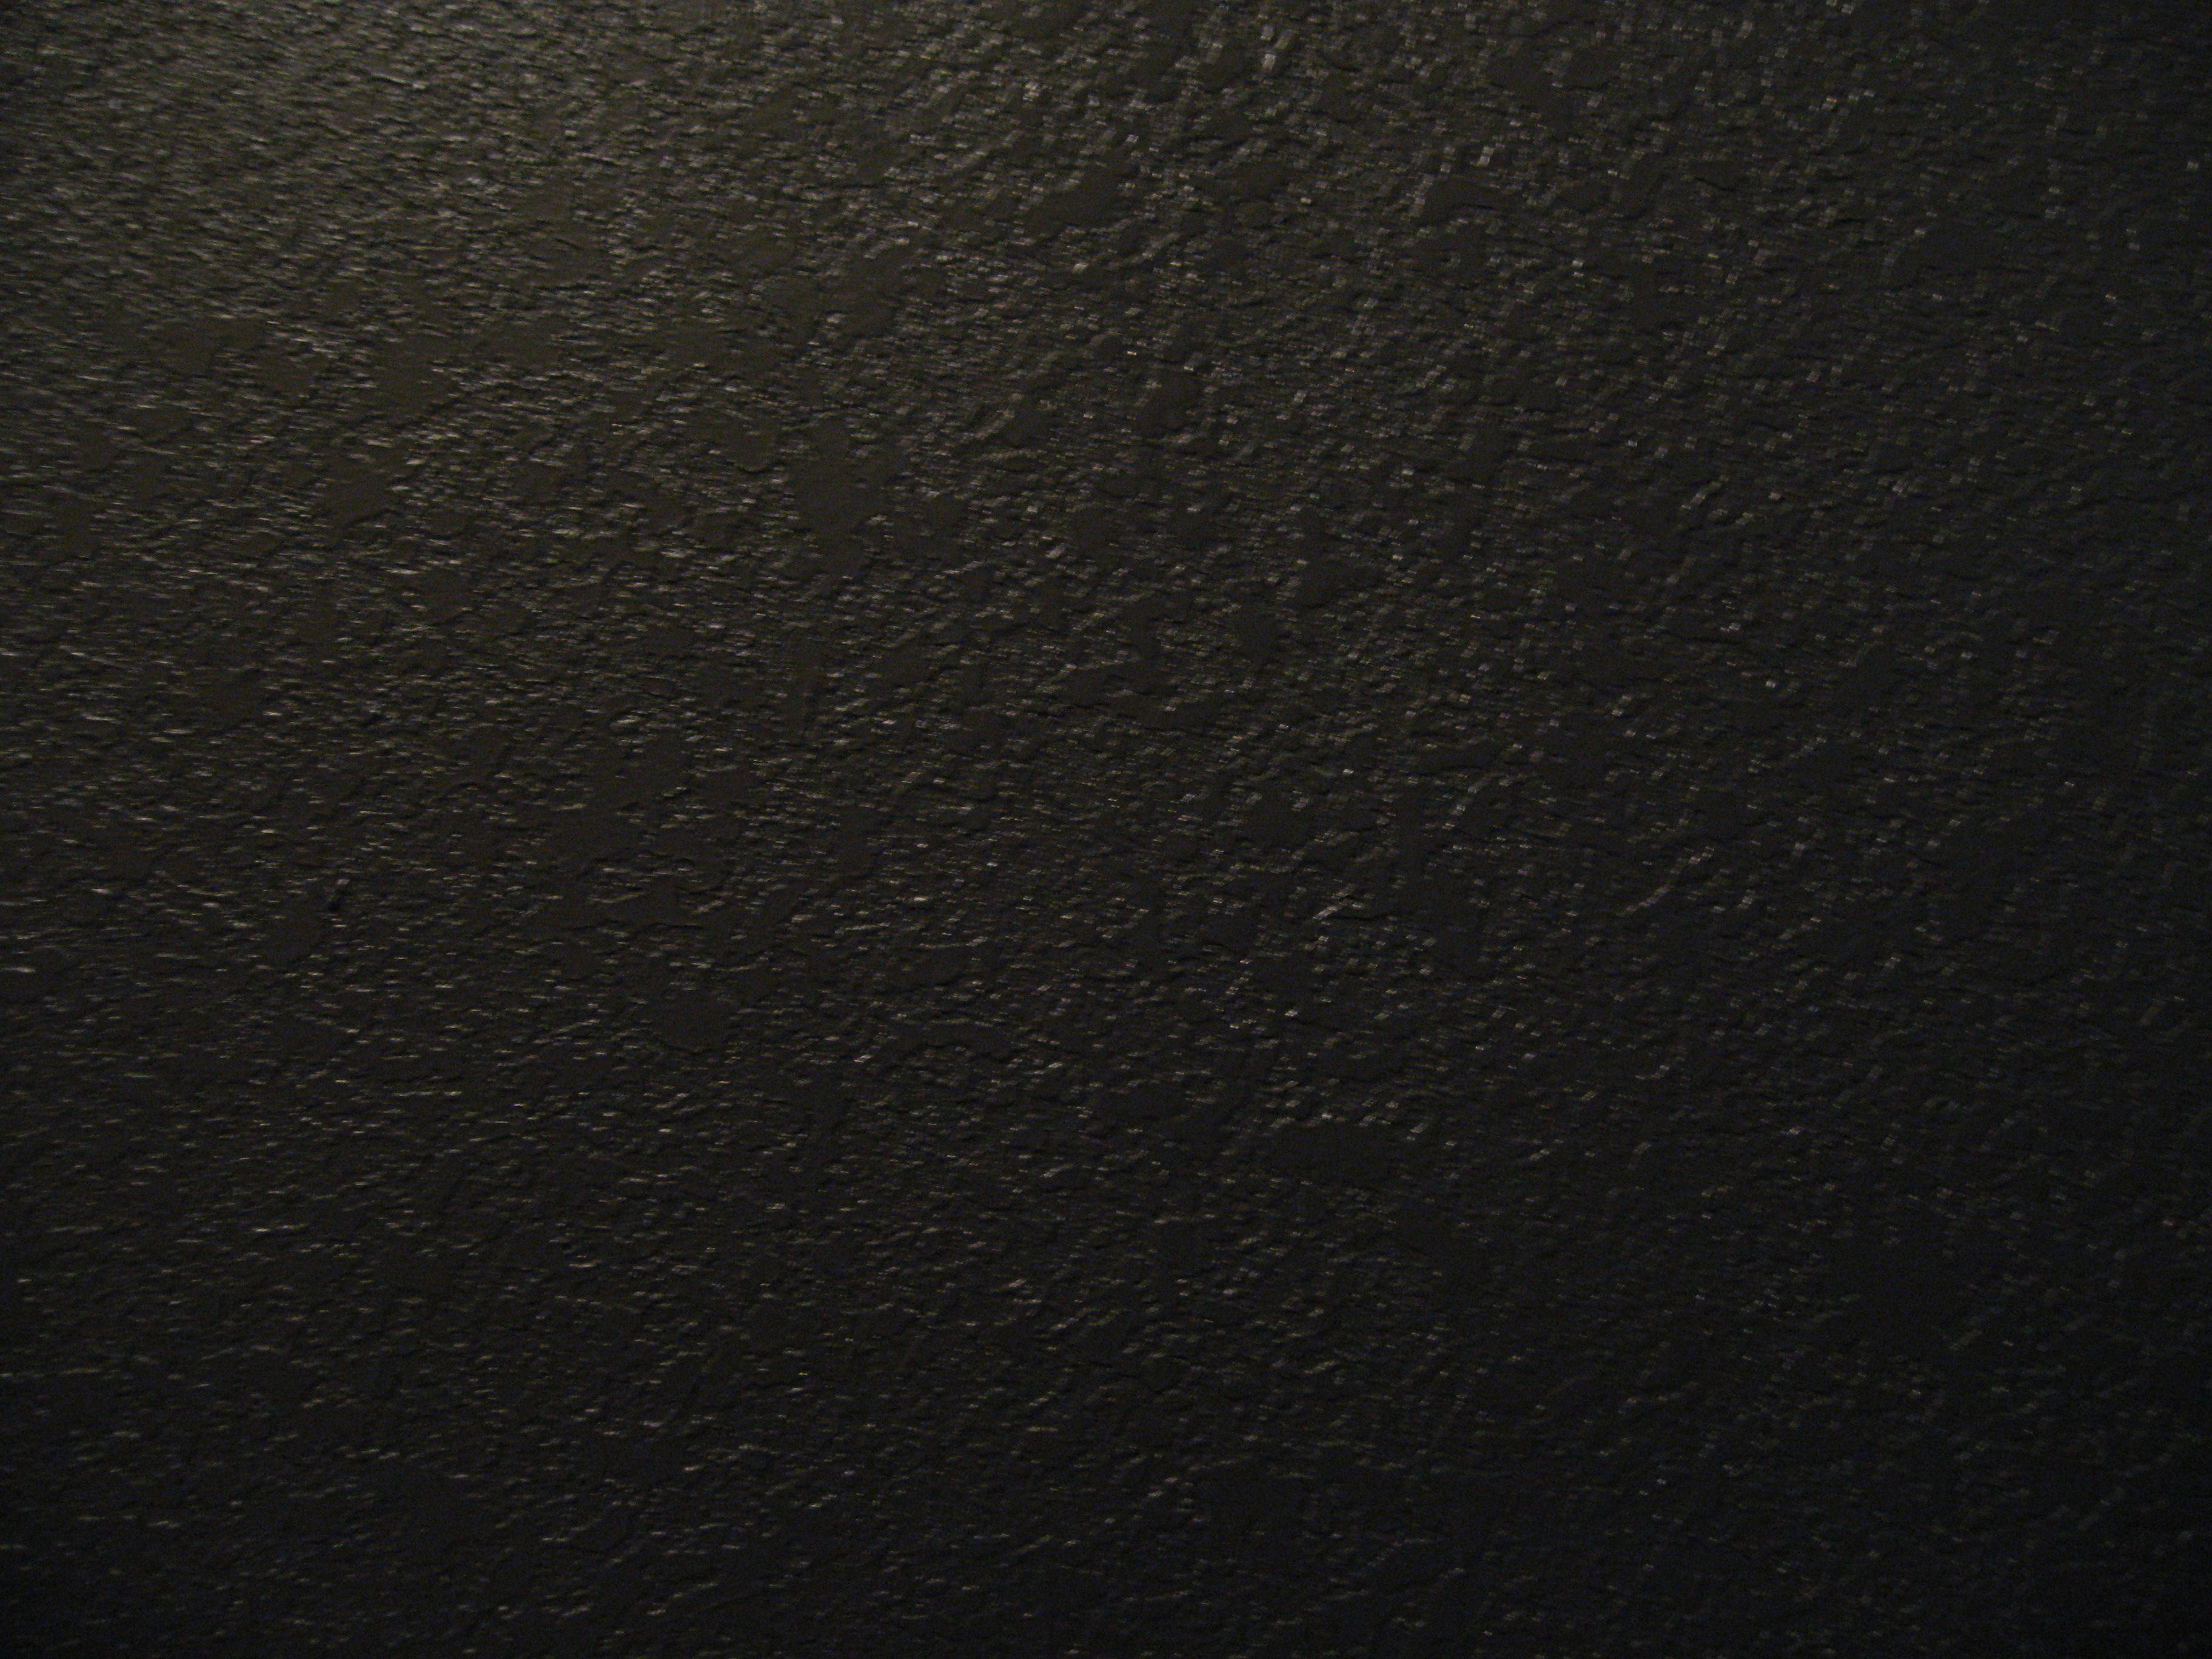 Black Painted Wall black-paint-plaster-interior-wall-2 | texture | pinterest